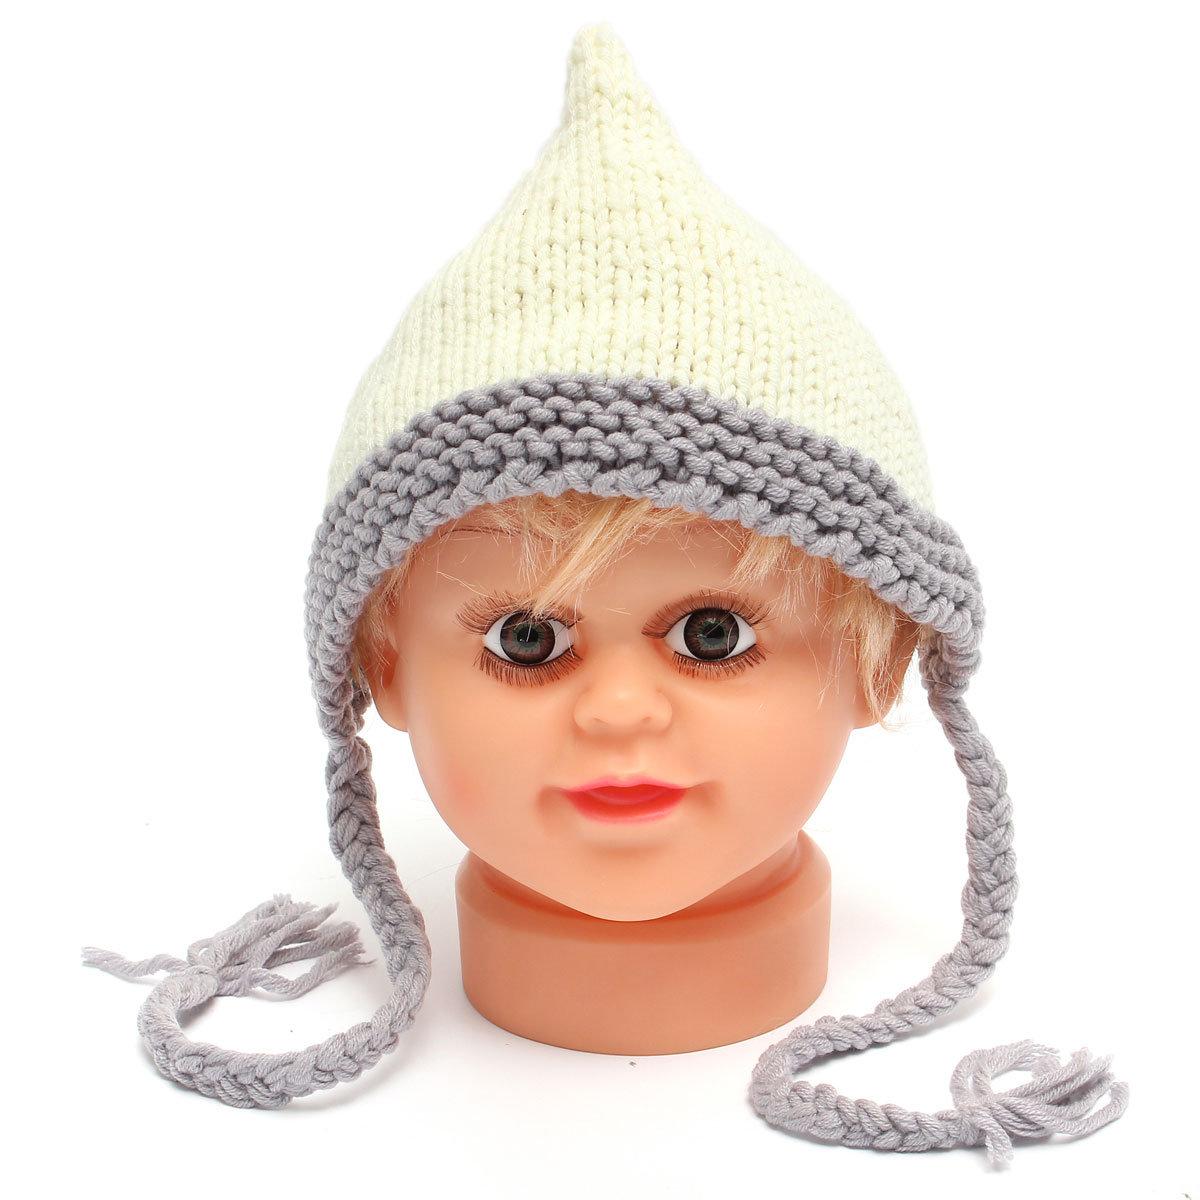 Newborn Baby White Crochet Knit Hat Photo Photography Prop Warm Cap